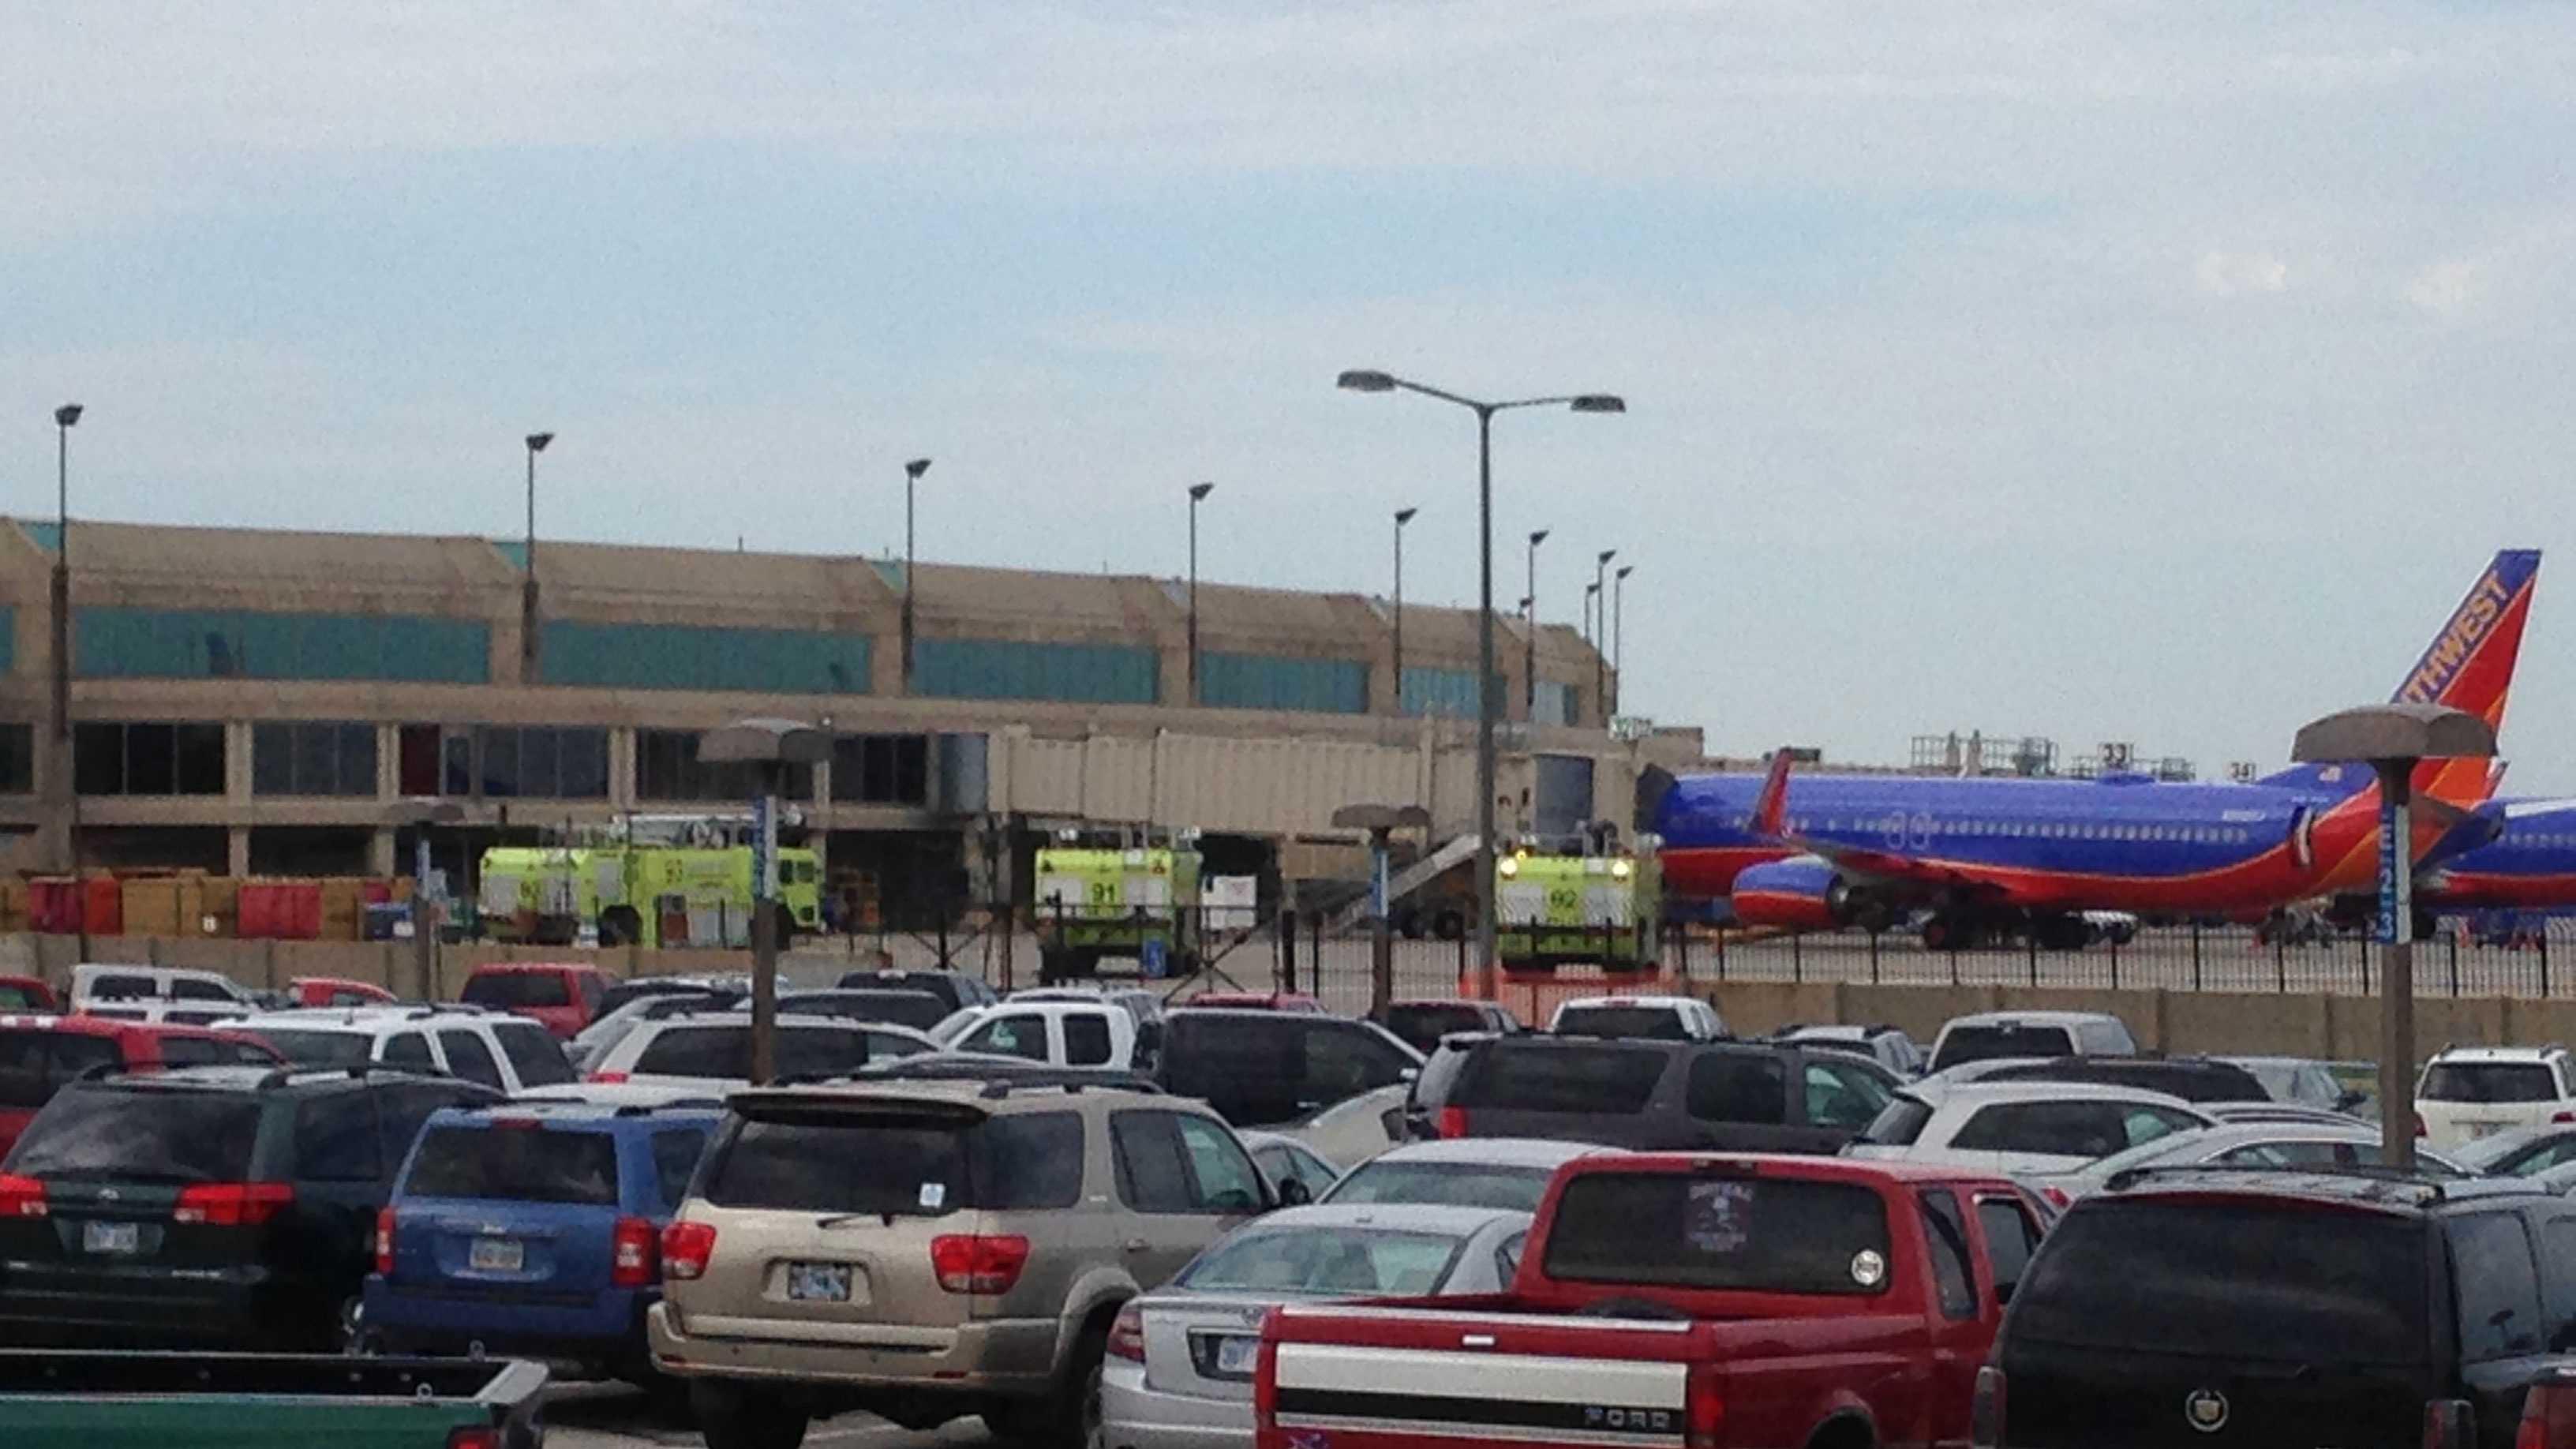 Southwest Airlines Flight 185